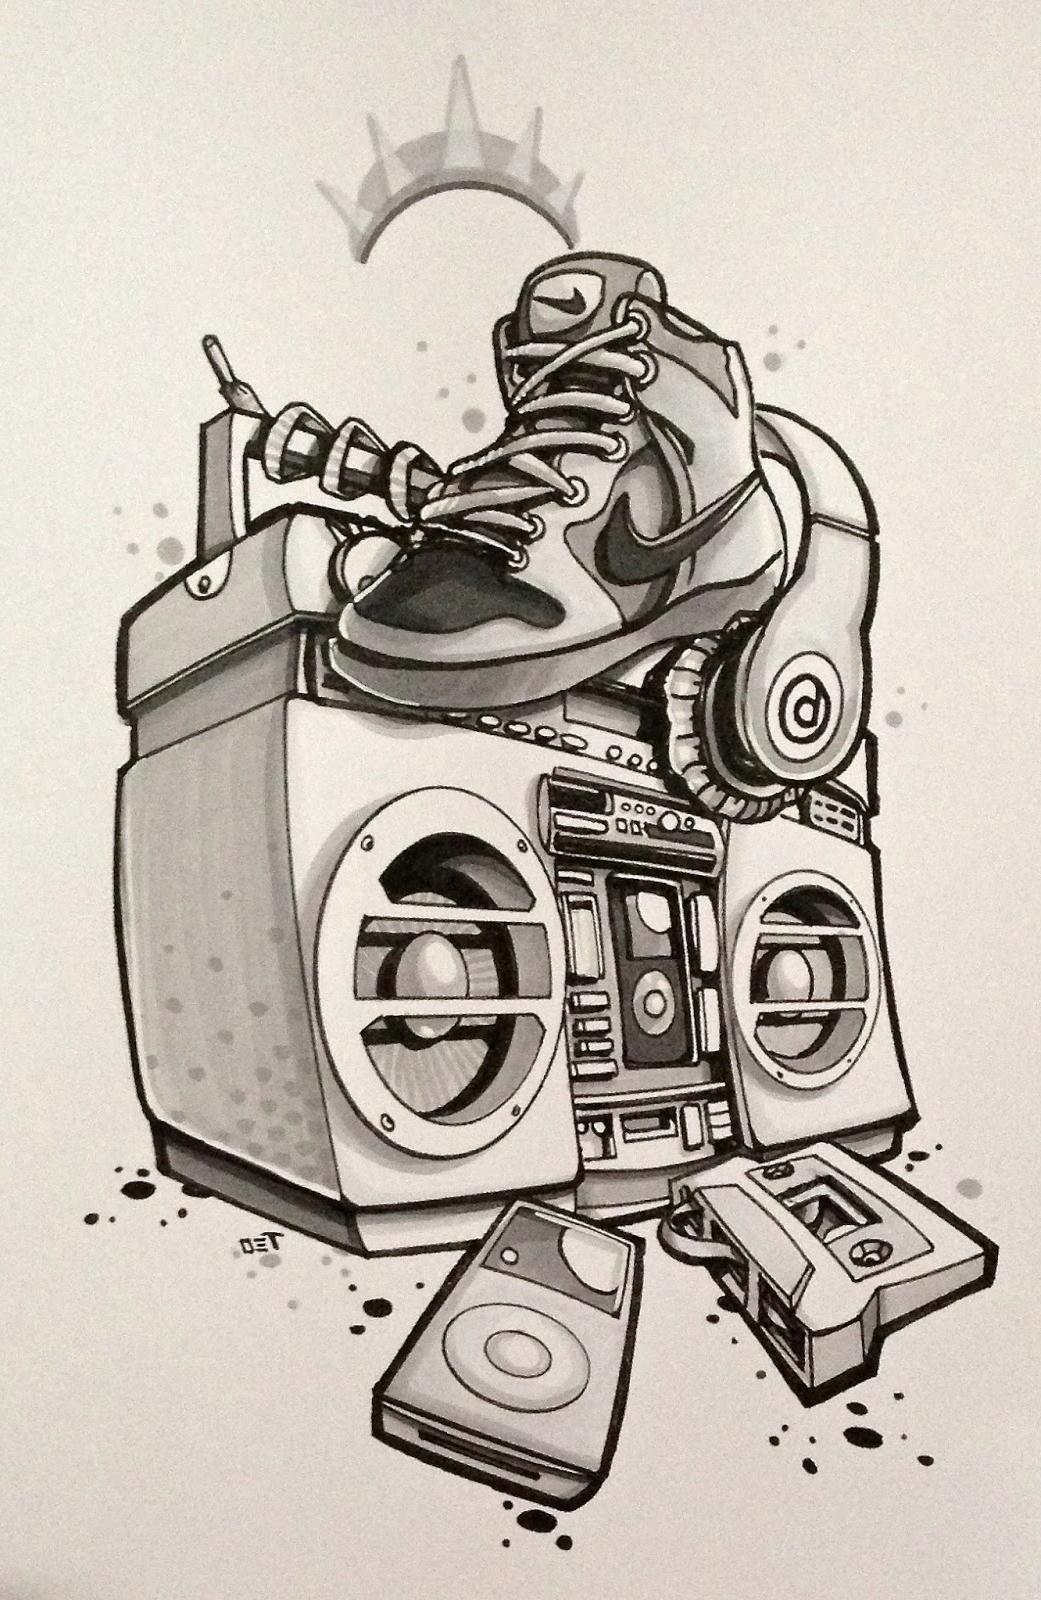 1041x1600 Hip Hop Tattoo Designs For Men